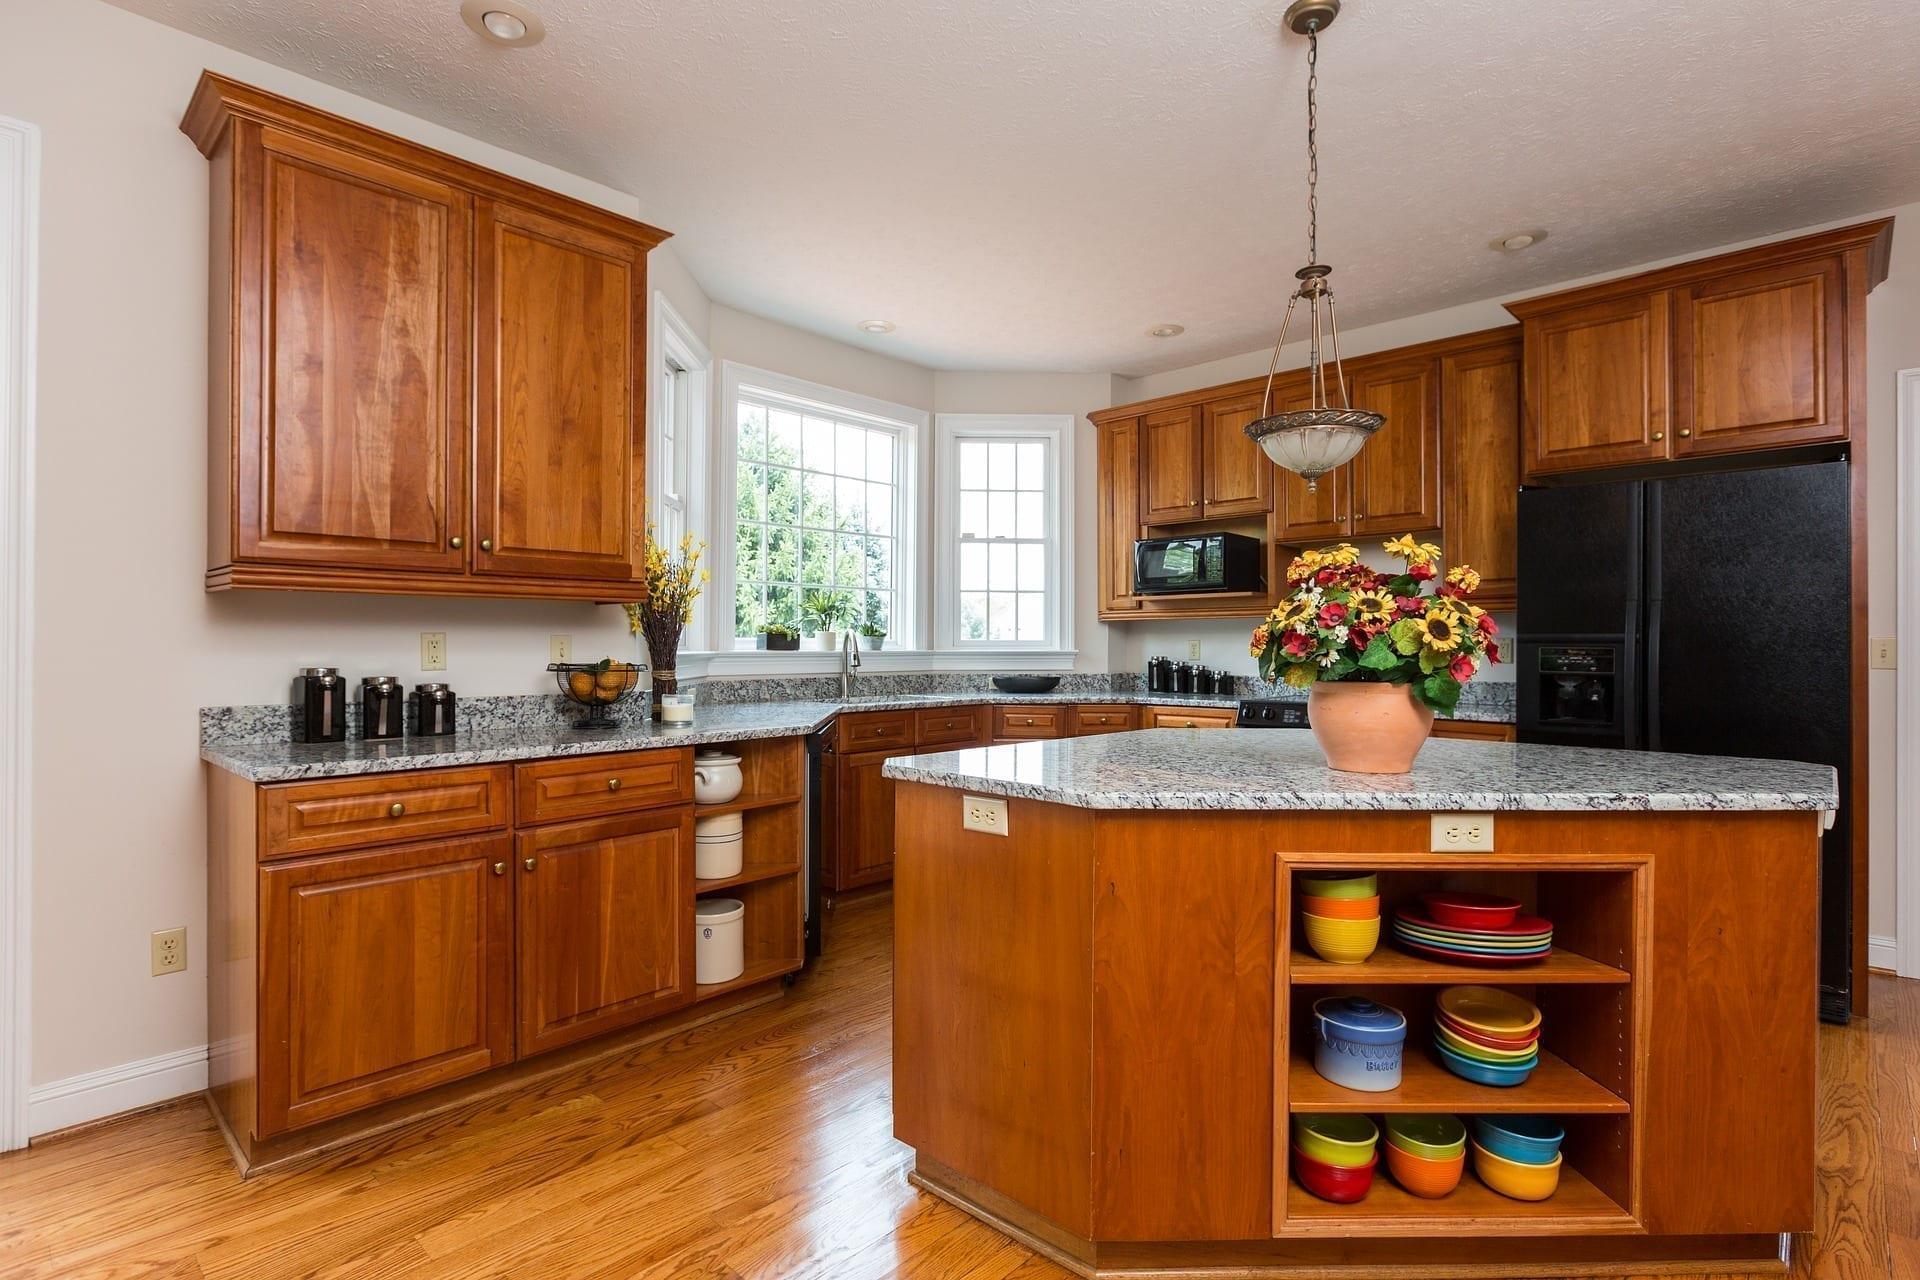 Kitchen that incorporated kitchen organization ideas like repurposing the kitchen island